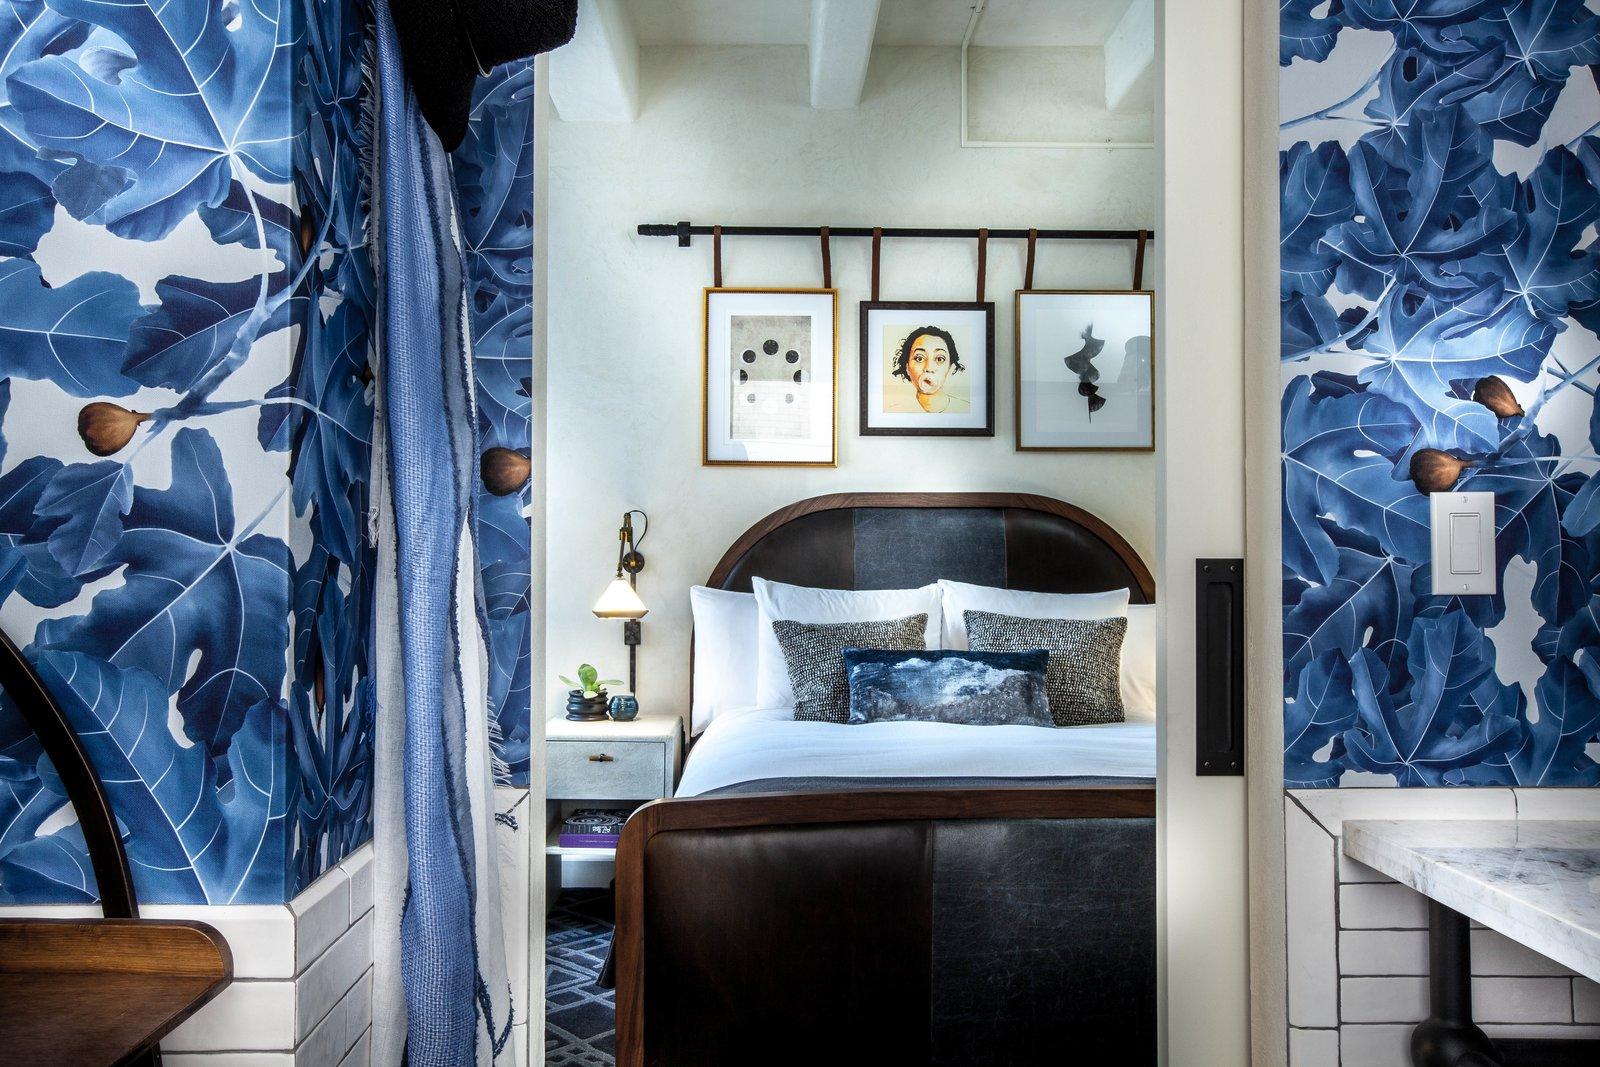 Hotel Figueroa bedroom with blue leaf wallpaper